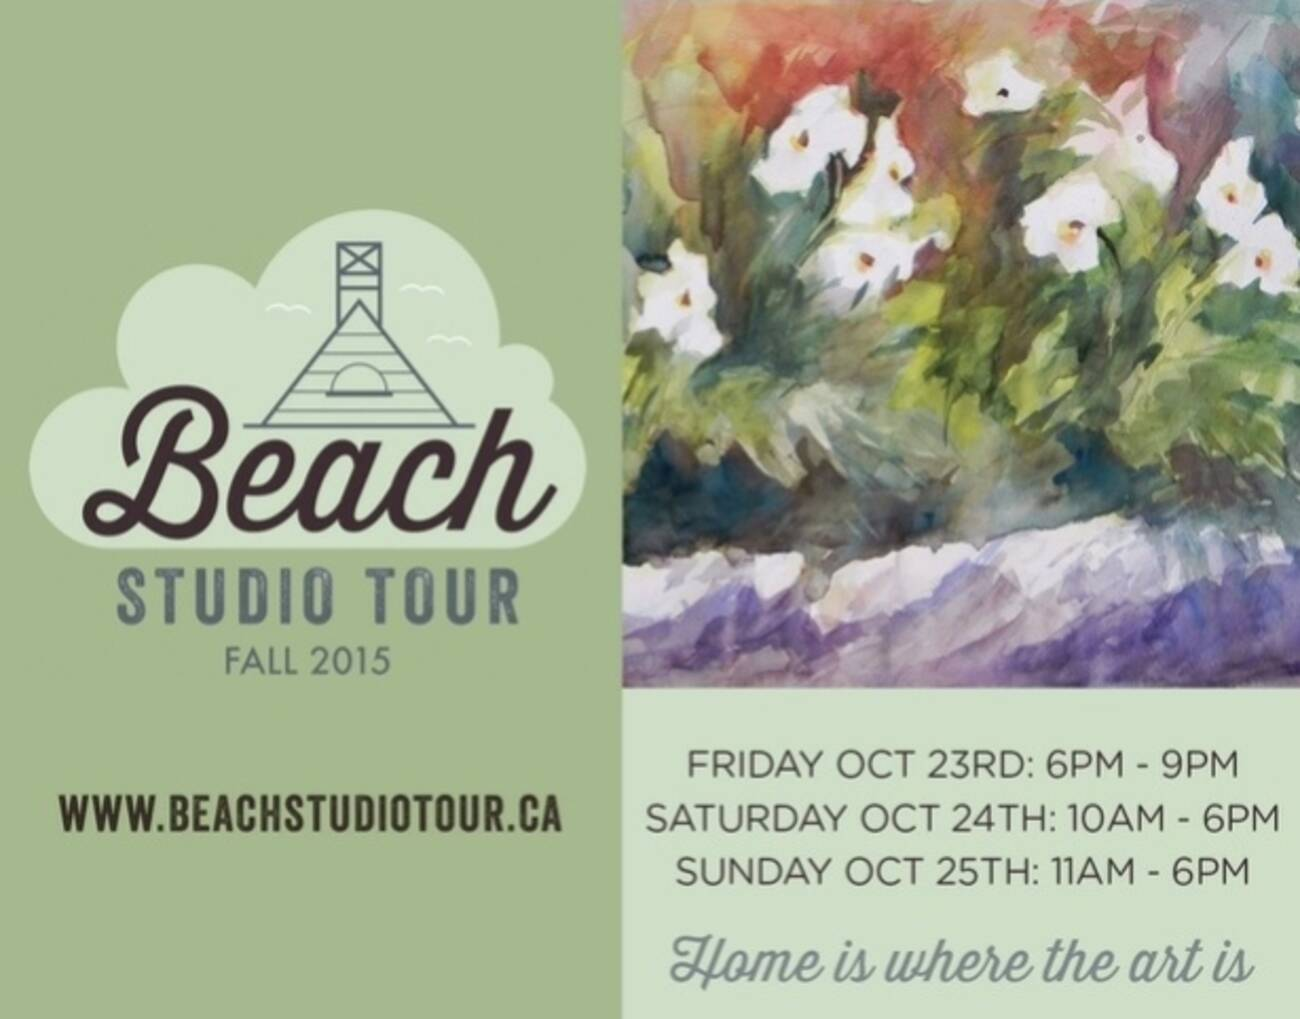 beach studio tour fall 2015. Black Bedroom Furniture Sets. Home Design Ideas